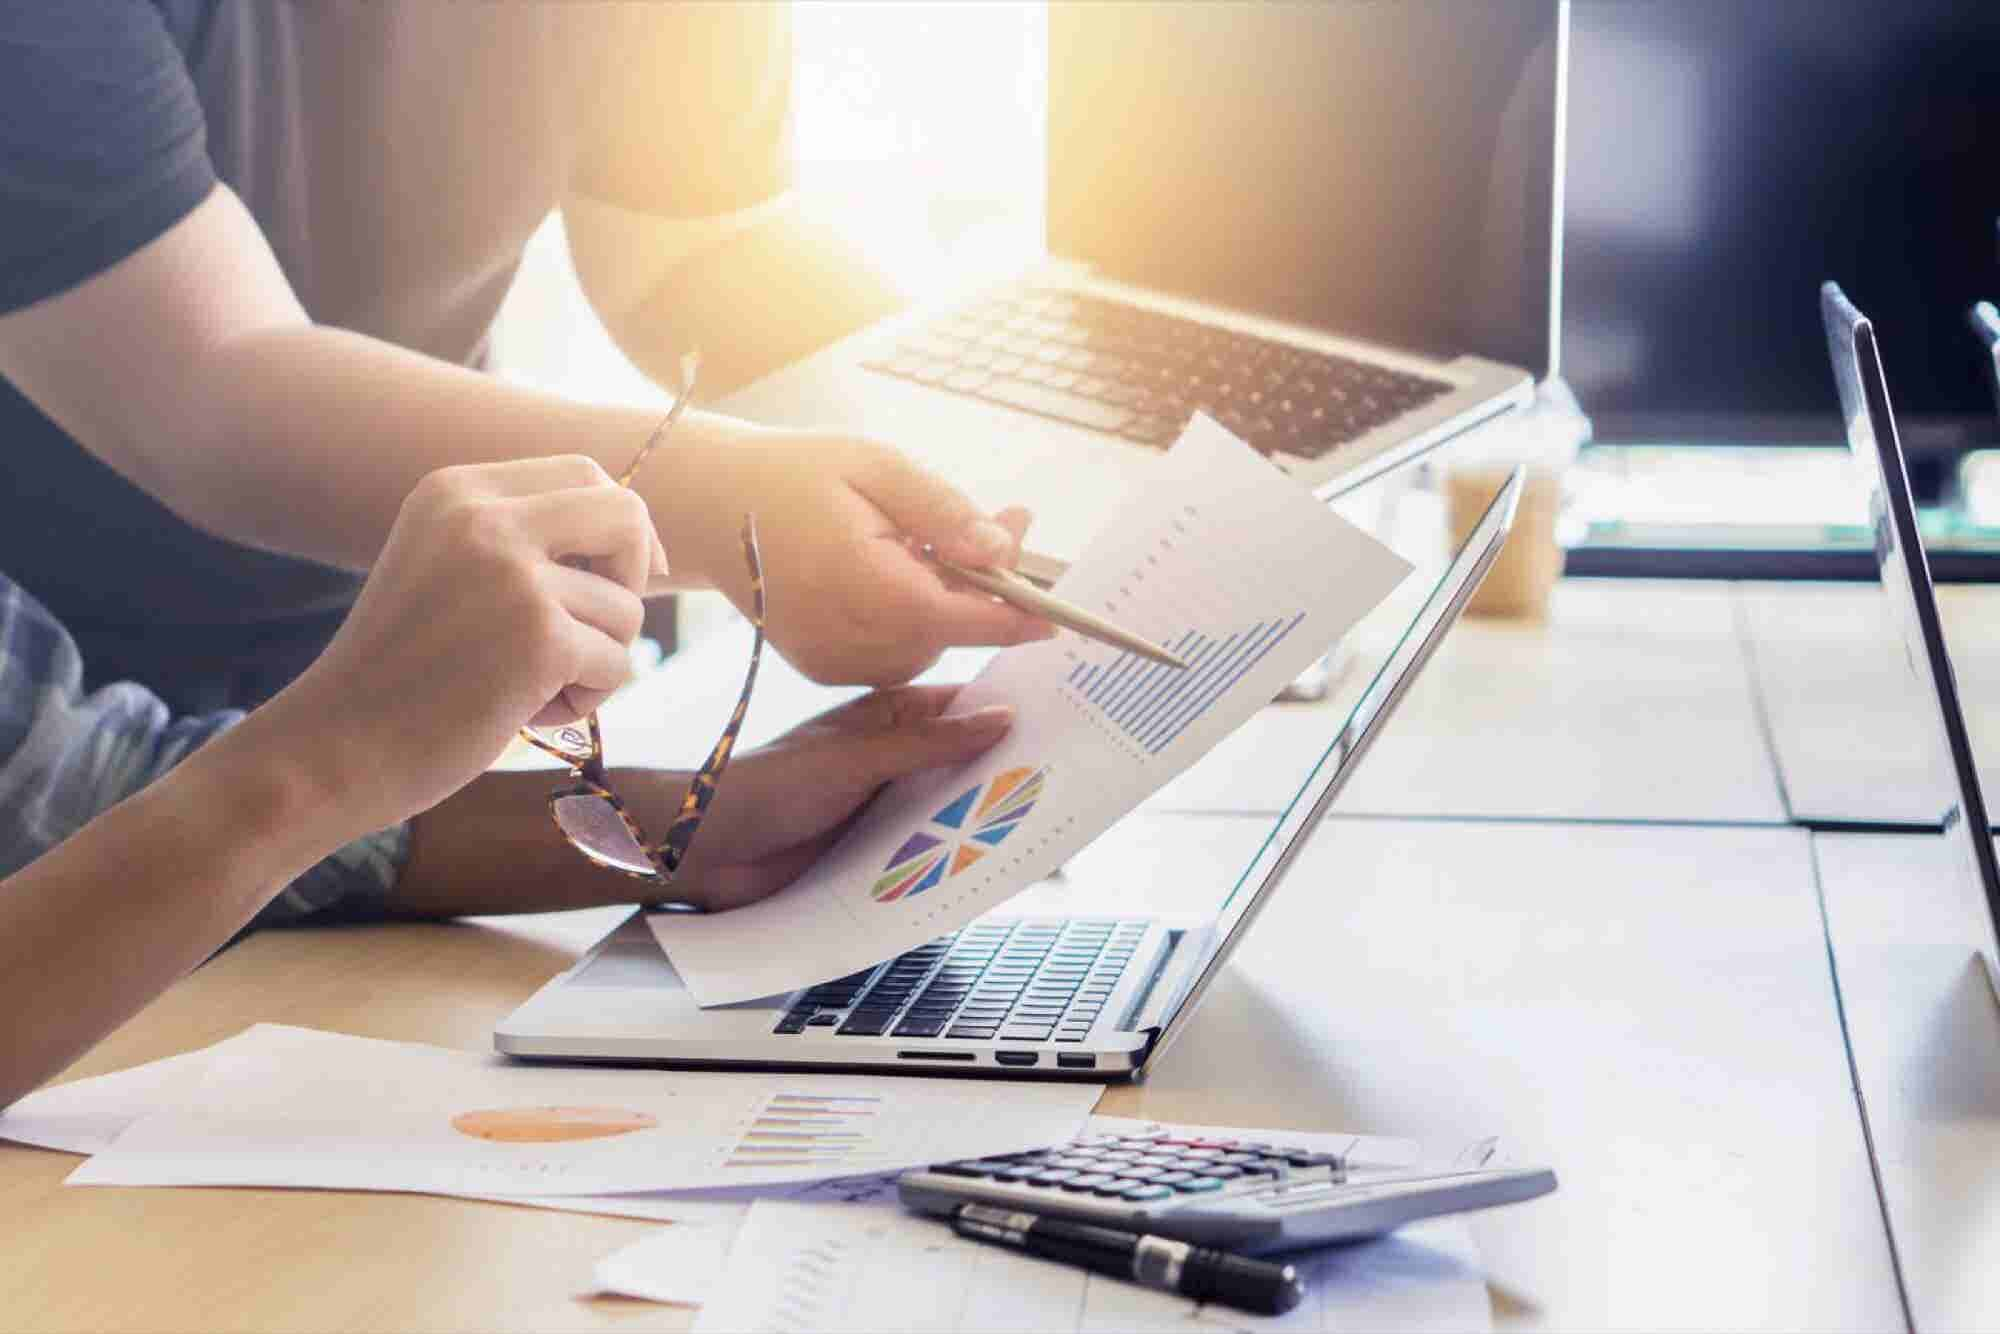 4 Effective Business Models That Built Billion-Dollar Companies